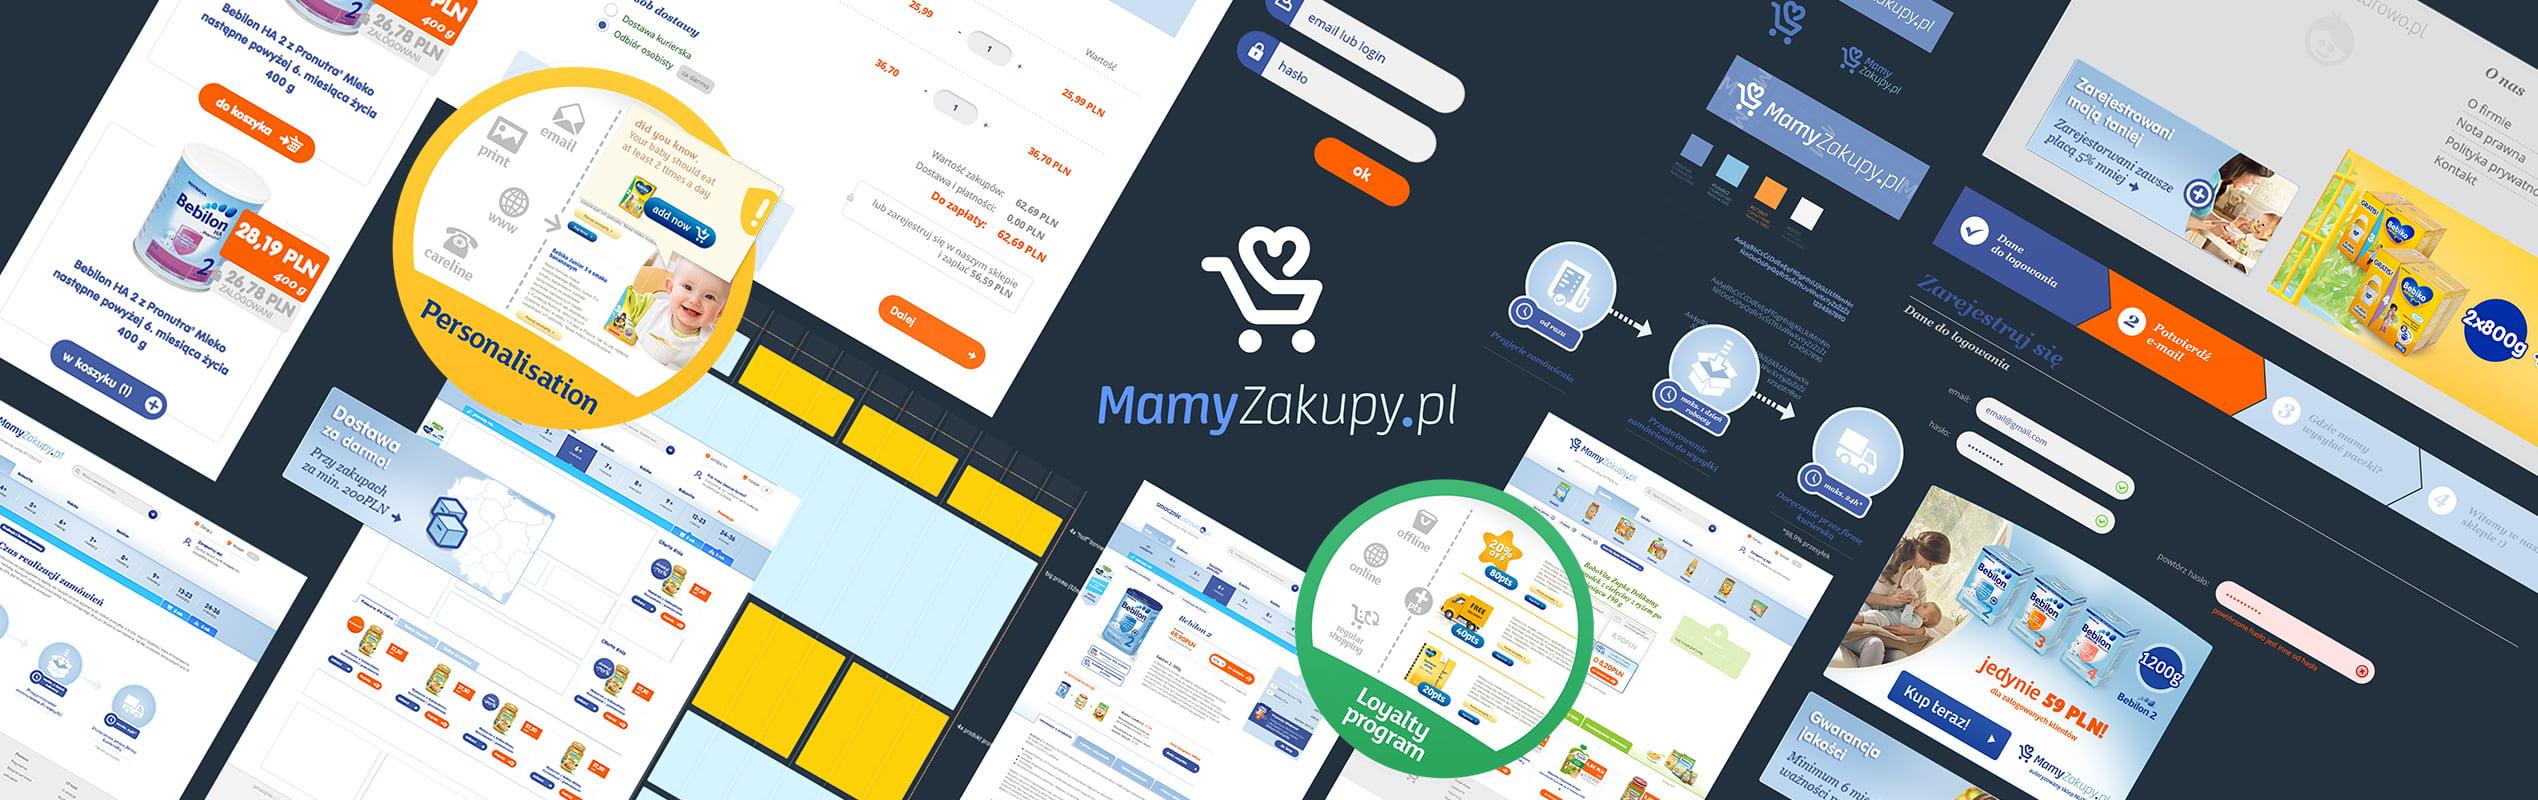 Mamyzakupy e-commerce platform